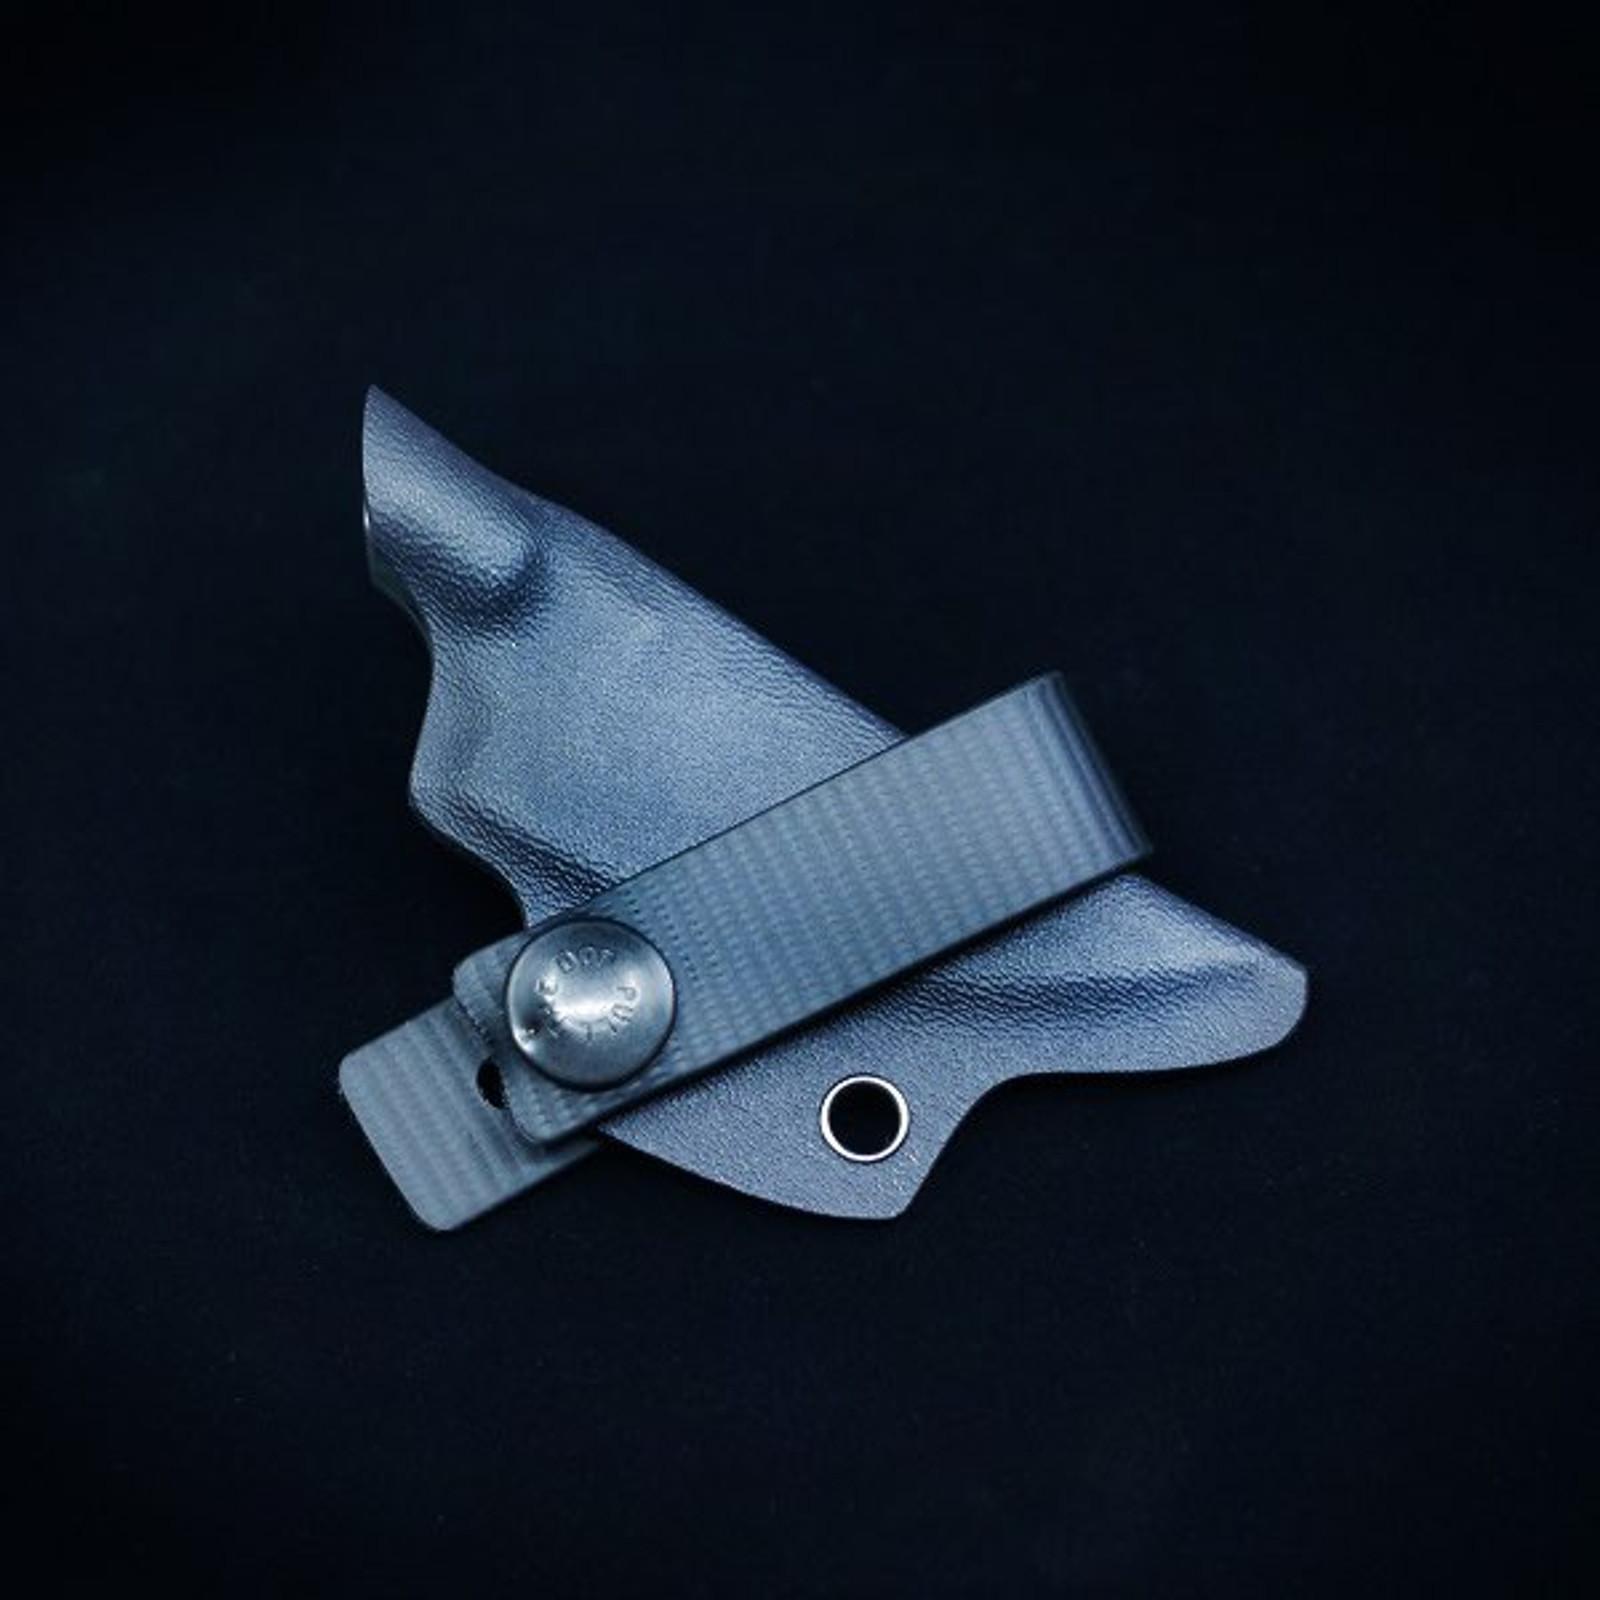 Clinch Pick Knife 2.0 - Shivworks